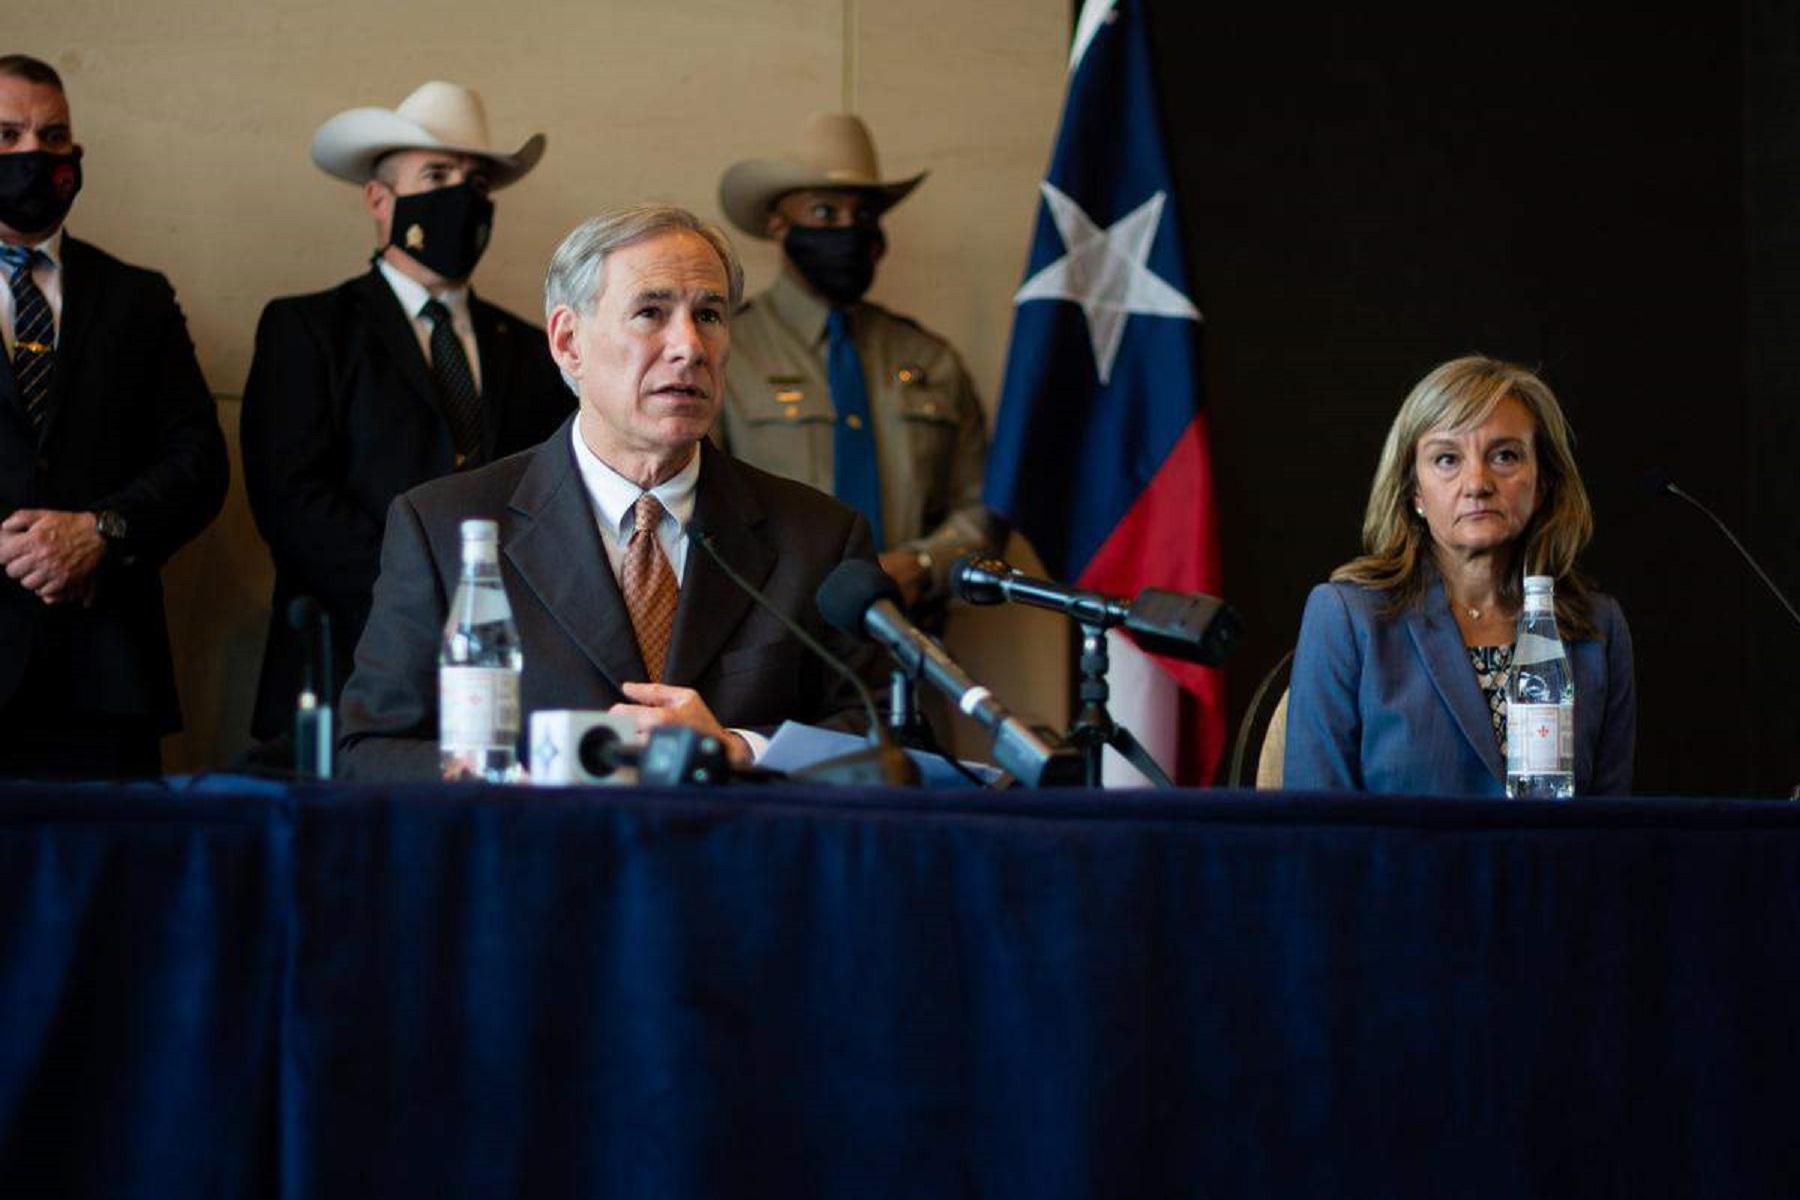 "Fauci Τέξας: Προειδοποίηση και ανησυχία του λοιμωξιολόγου για το ""άνοιγμα"" του κράτους"